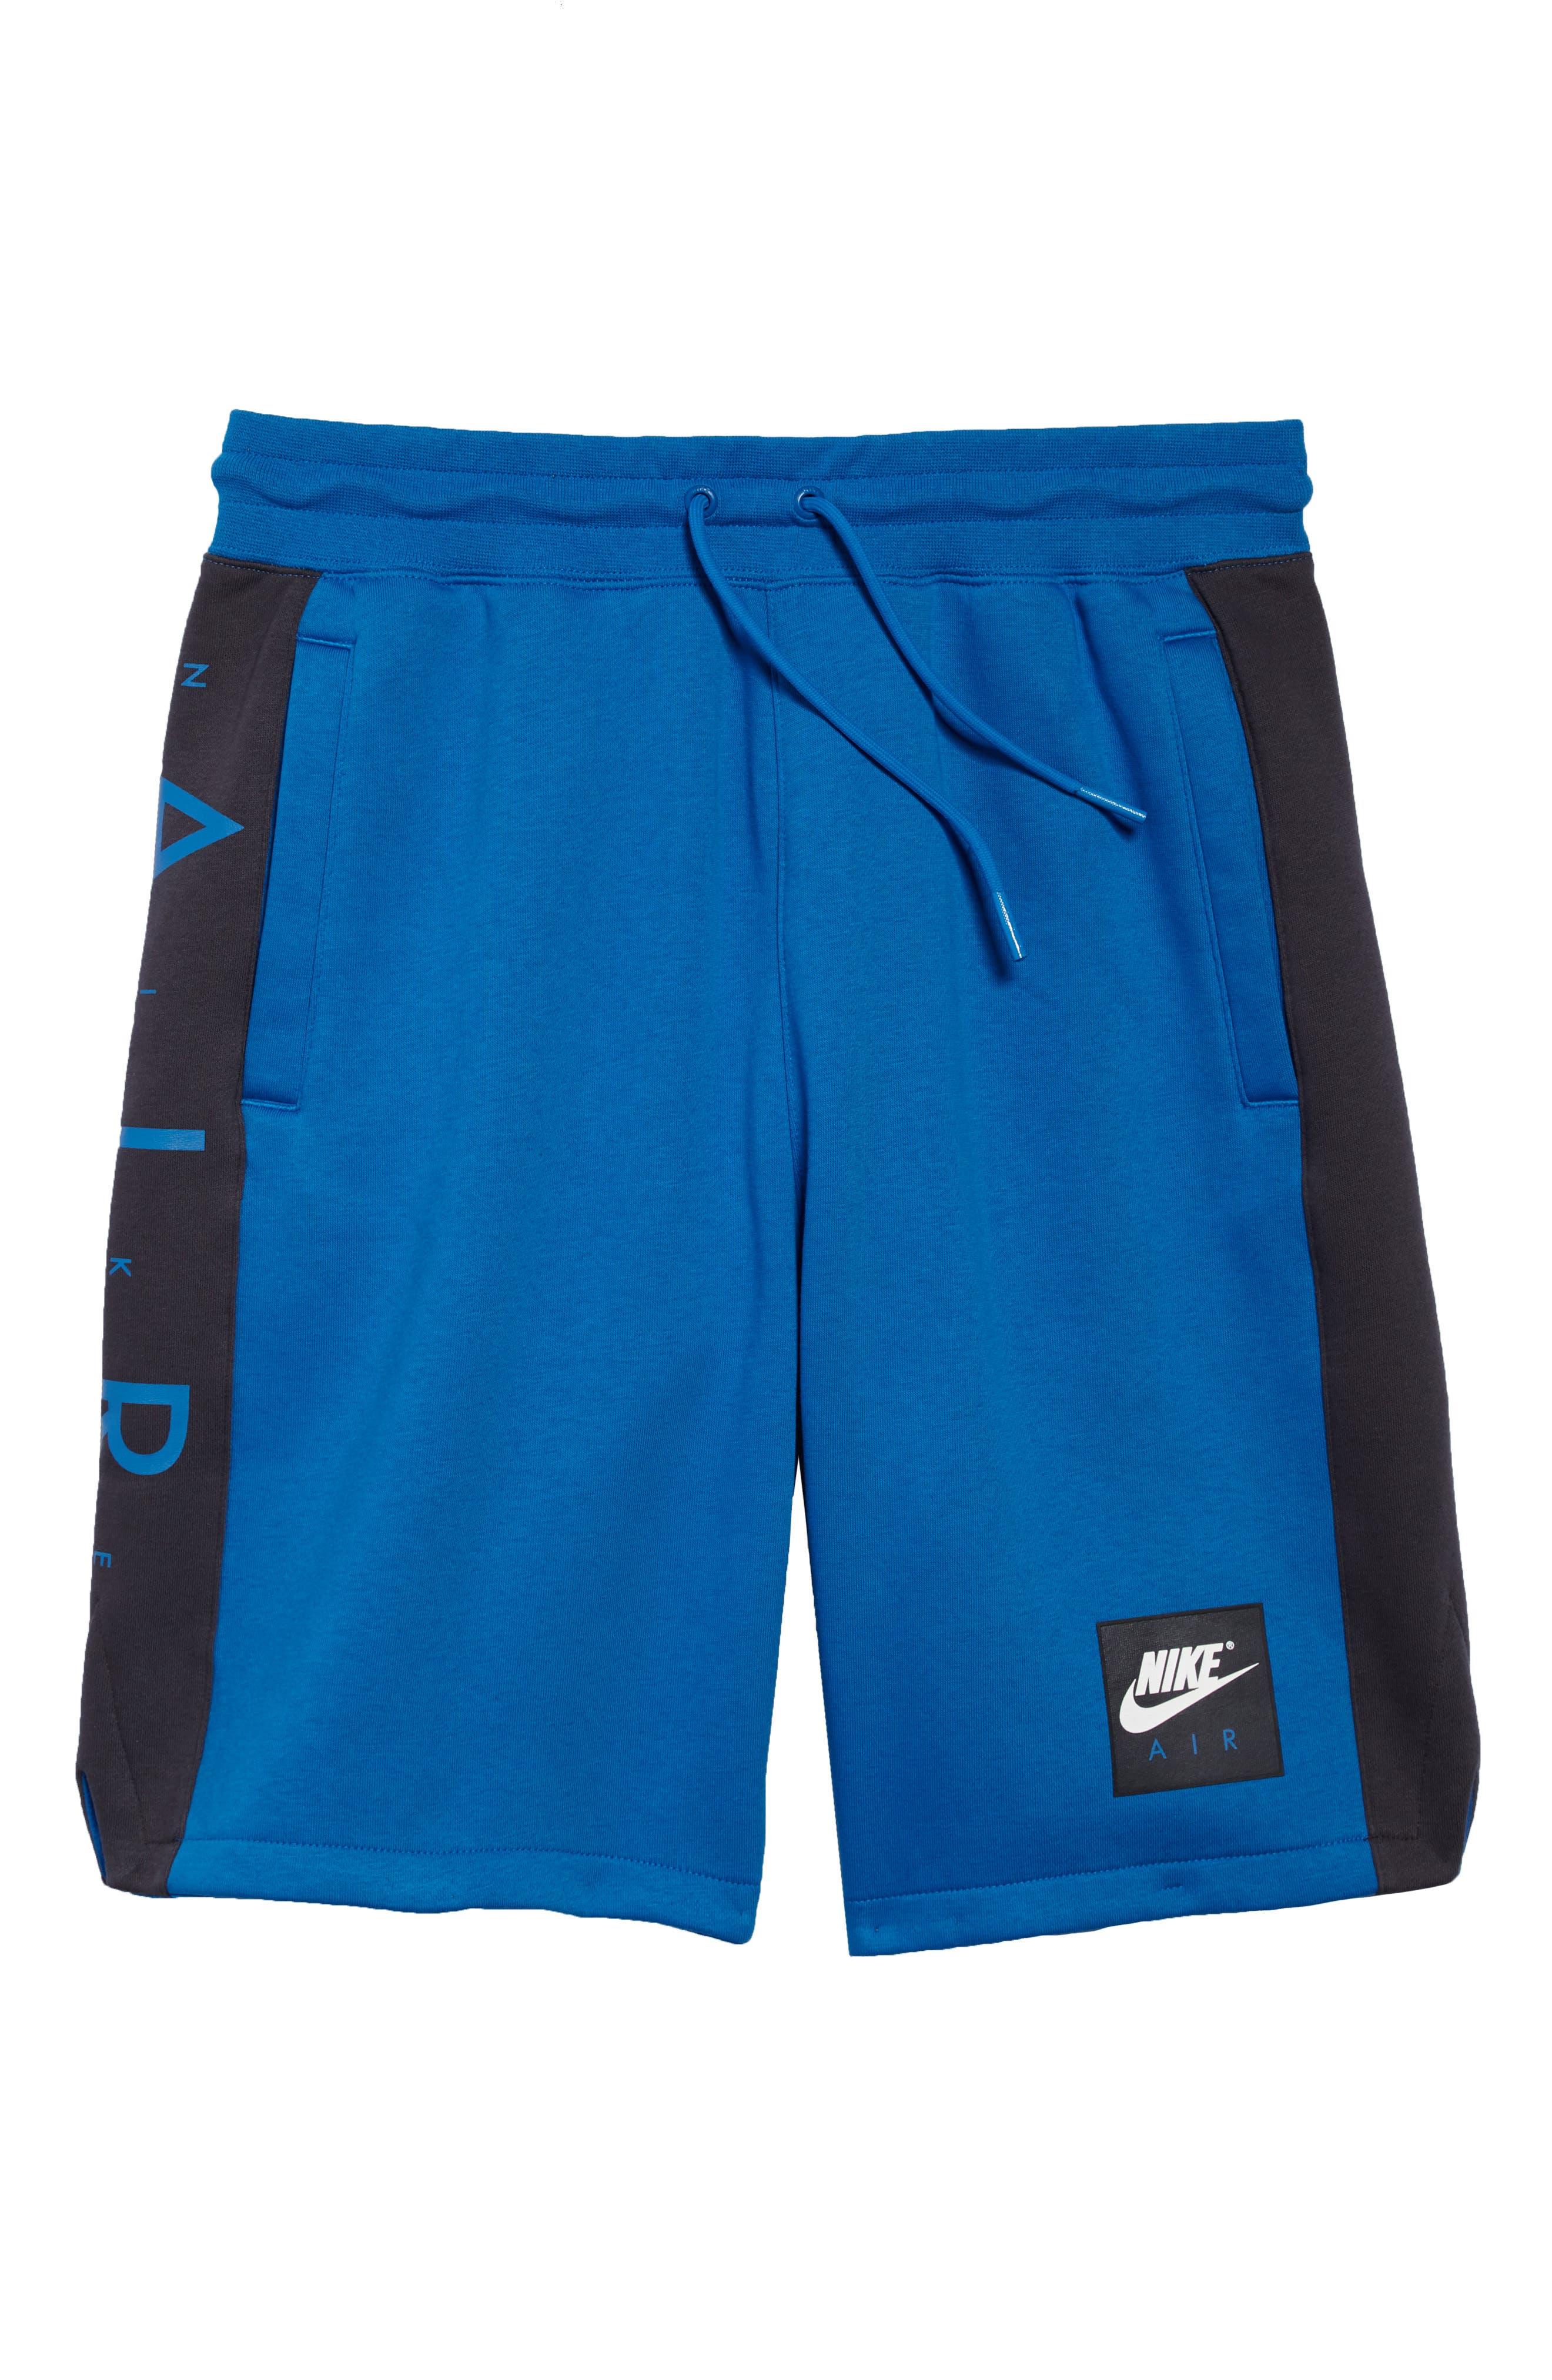 Sportswear Air Fleece Shorts,                             Alternate thumbnail 6, color,                             Blue Nebula/ Anthracite/ White